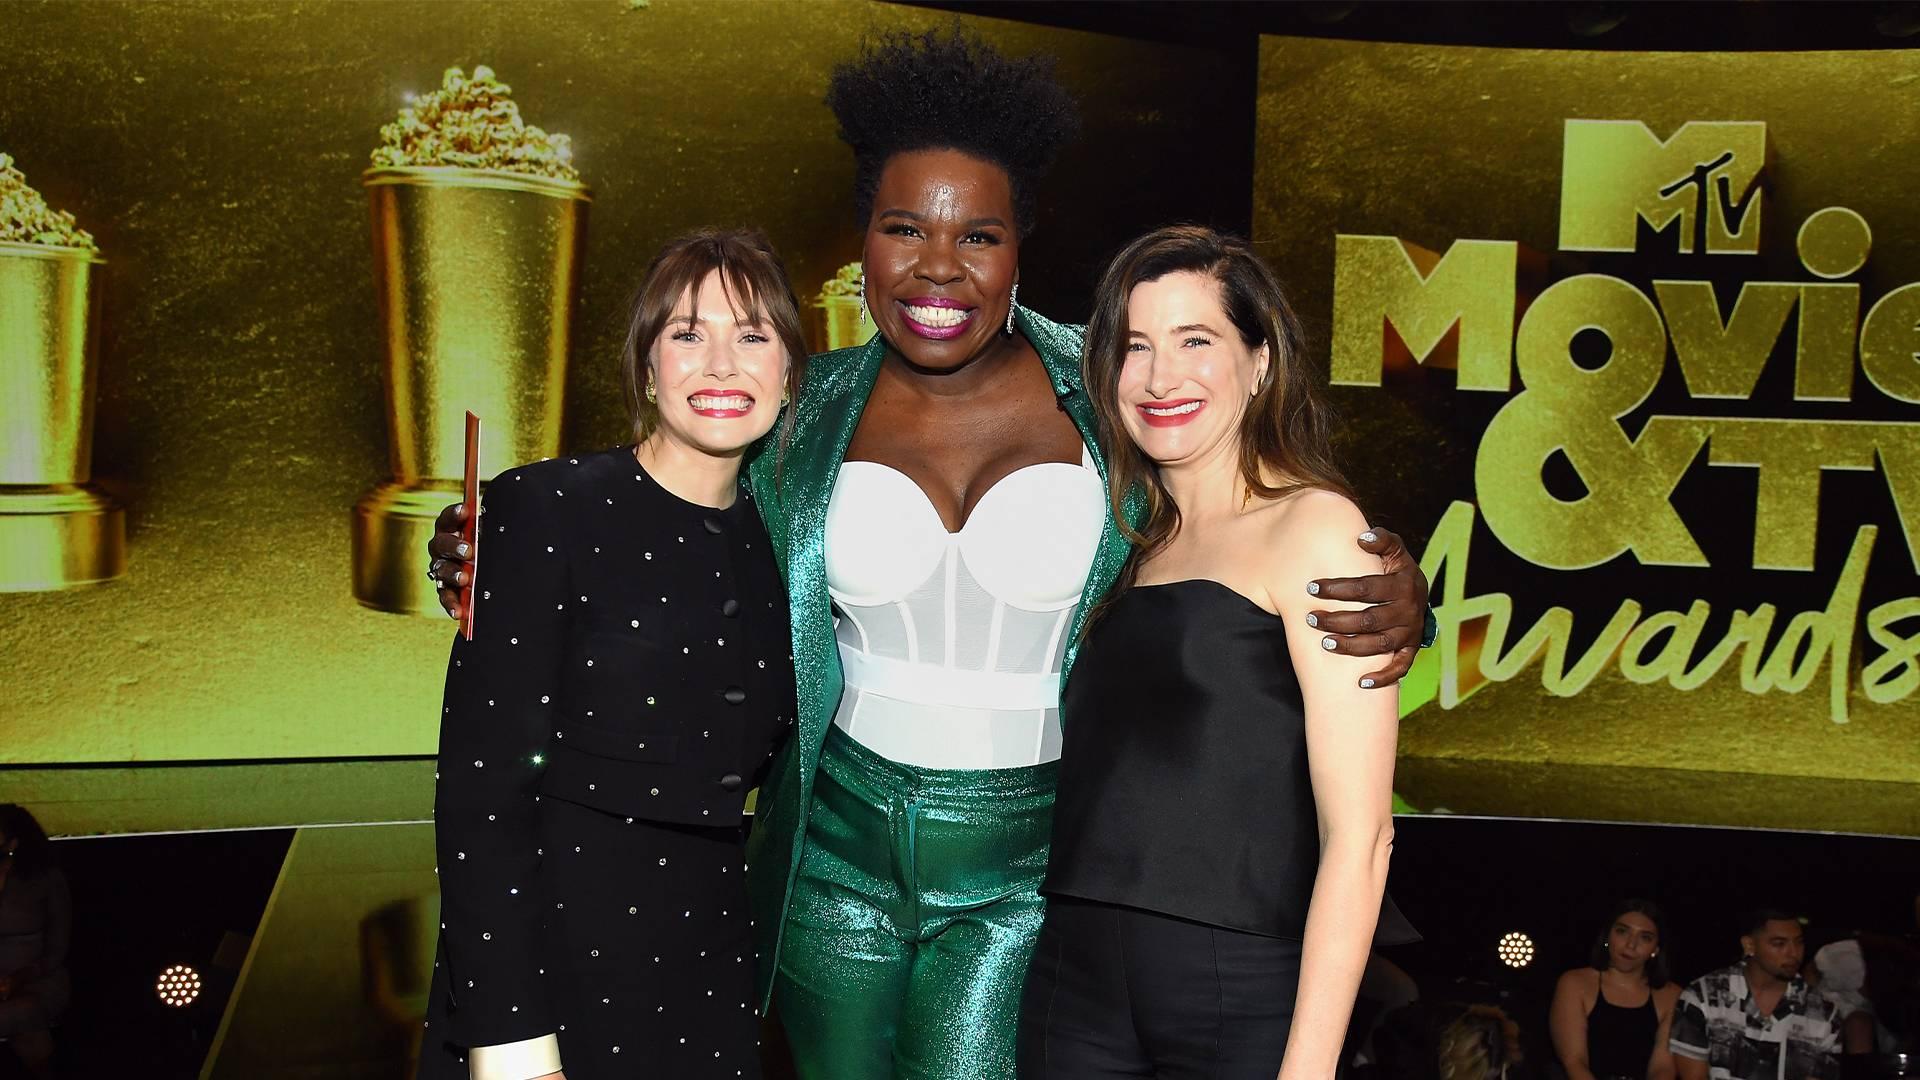 Movie & TV Awards 2021 | Highlights Gallery Leslie Jones/Elizabeth Olsen/Kathryn Hahn | 1920x1080